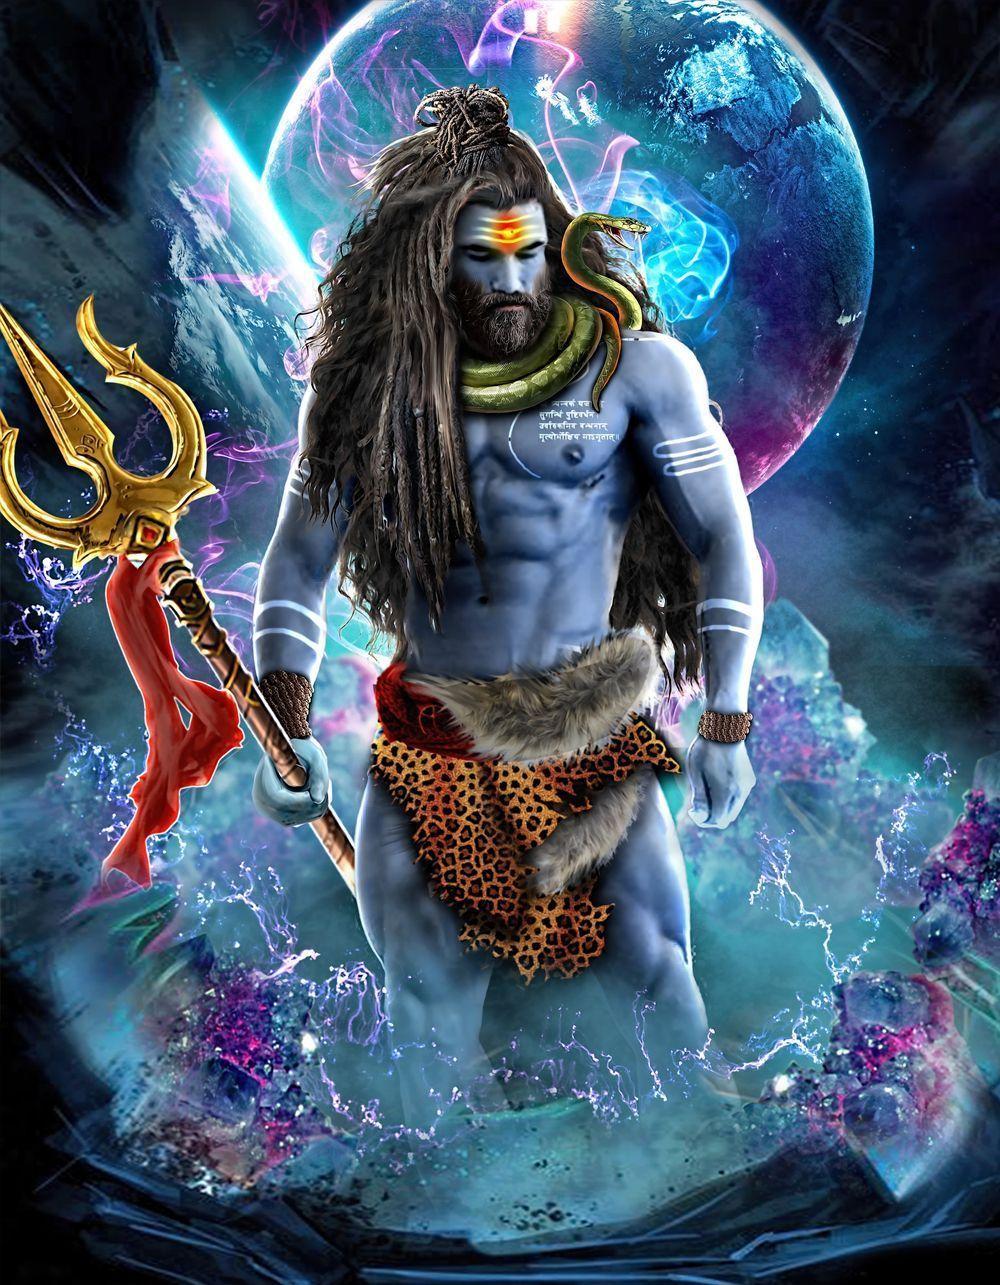 Shiv Mahadev Hd Wallpaper Pour Shivratri 2019 Tlk2trend In 2021 Lord Shiva Hd Images Lord Shiva Painting Lord Shiva Family